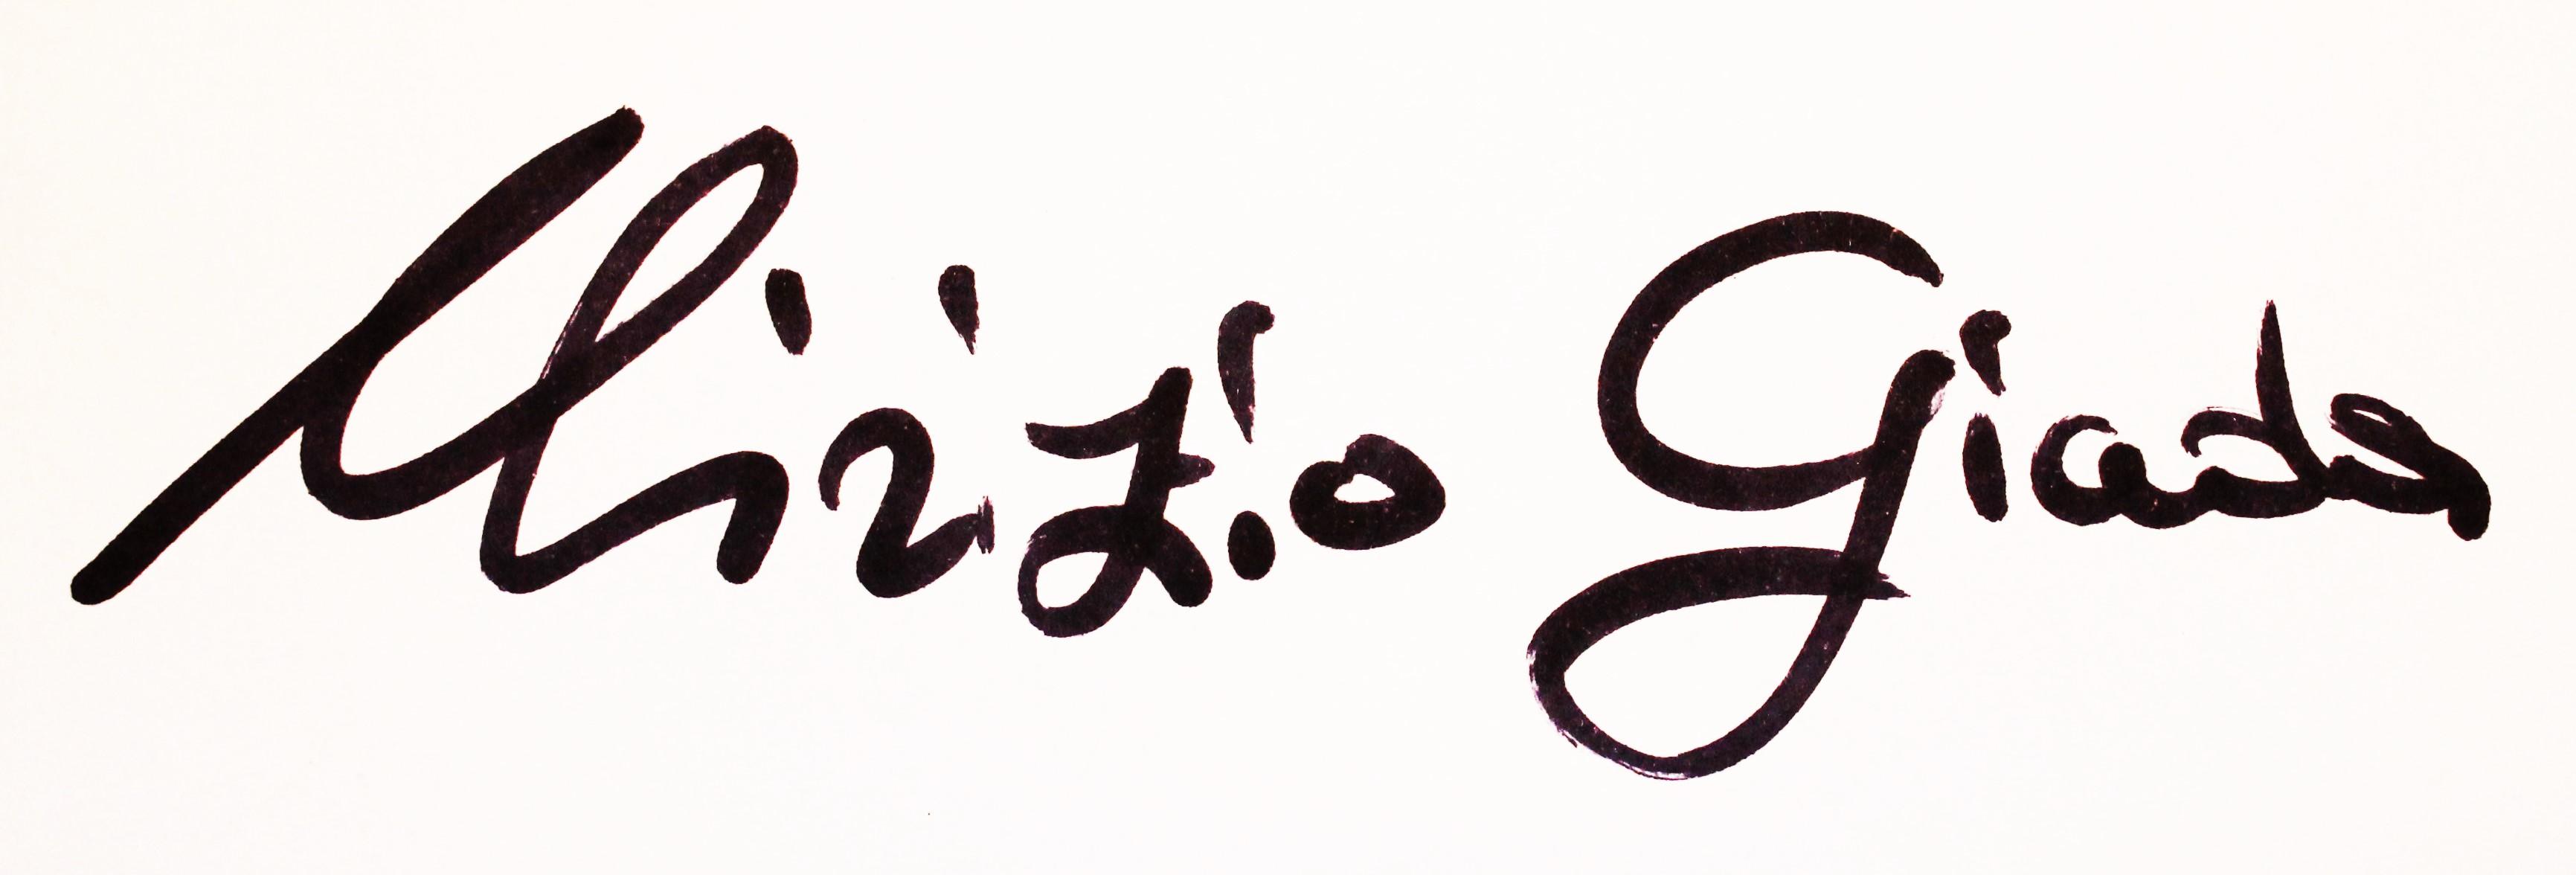 Giada Mirizio Signature